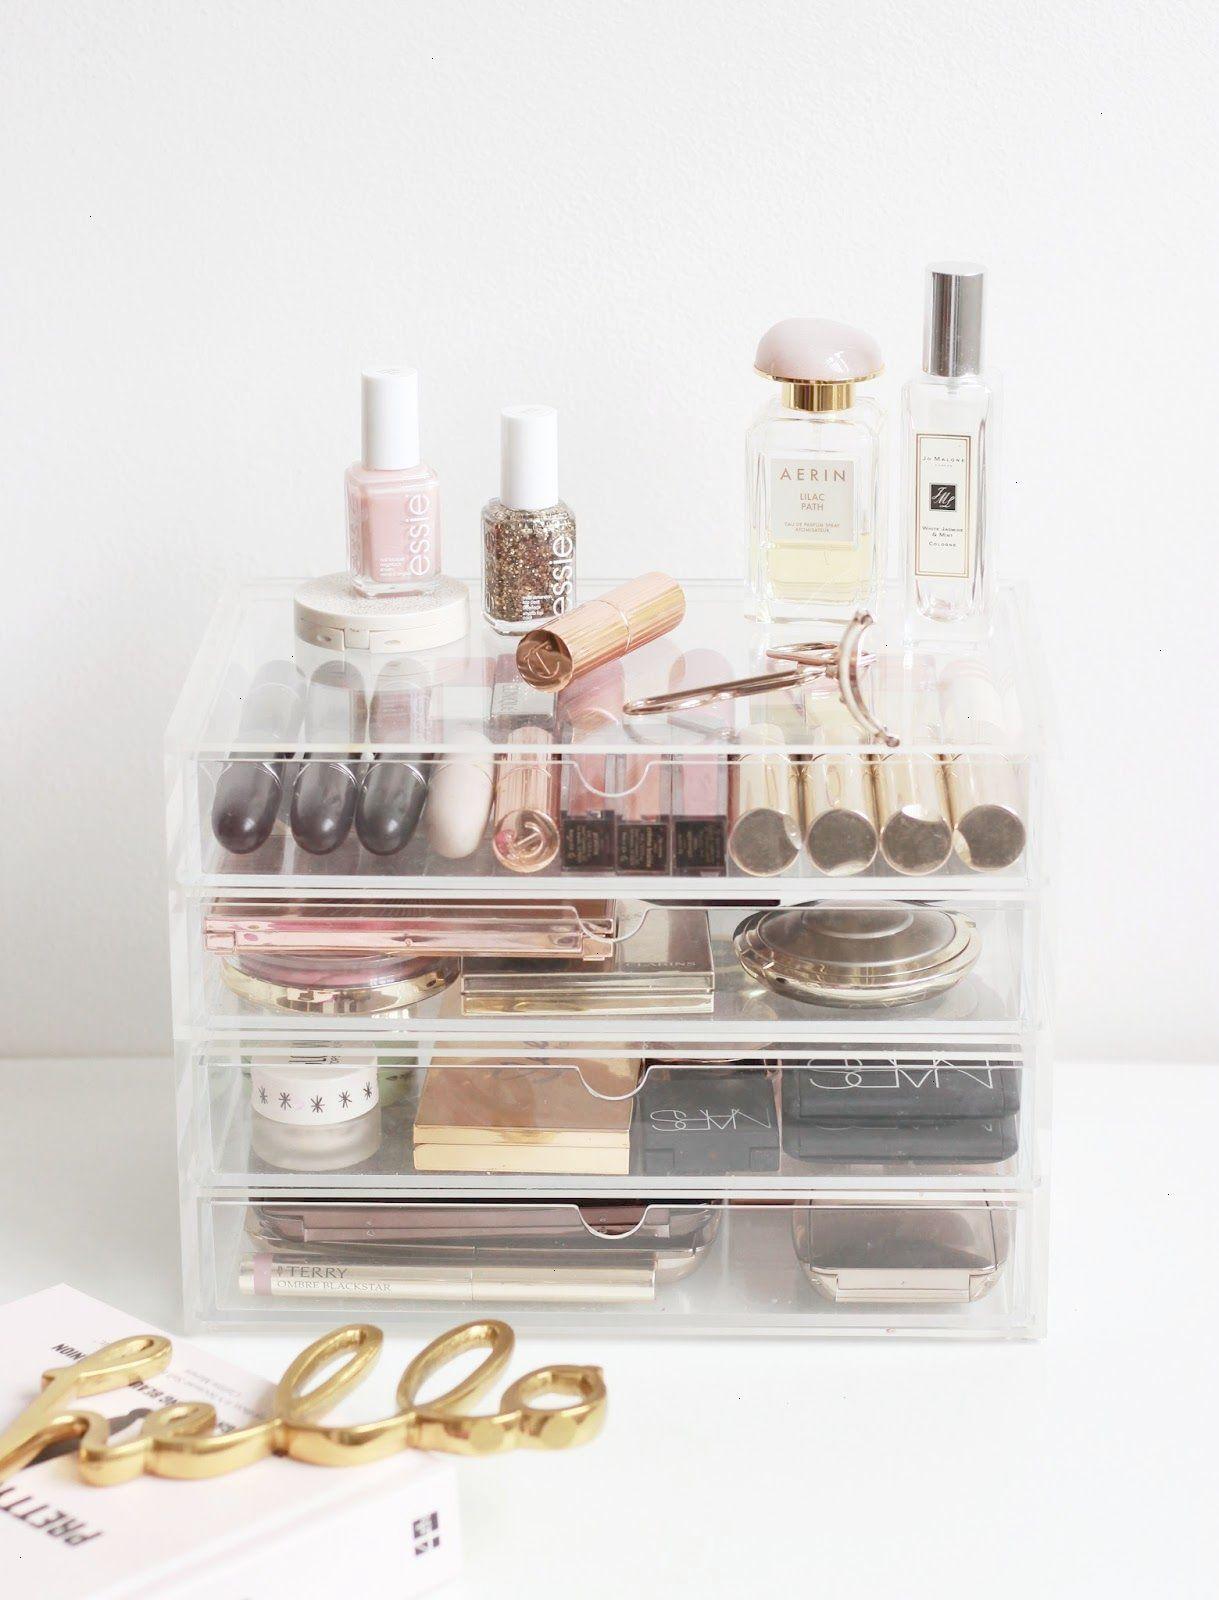 A Muji Makeup Storage Overhaul - Pint Sized Beauty